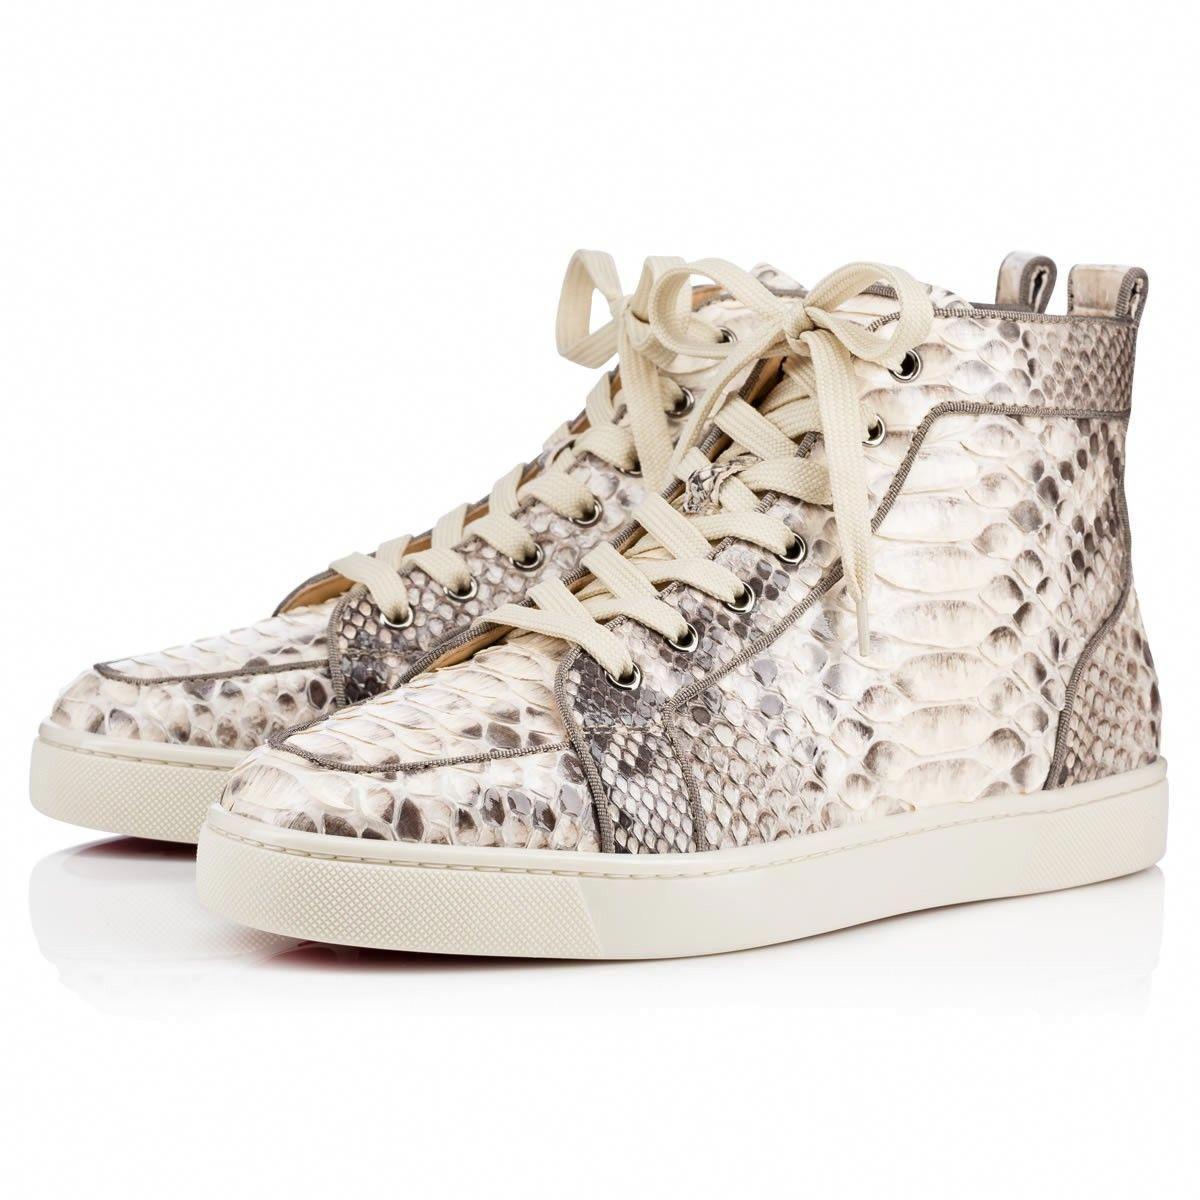 0238d94f0f0d CHRISTIAN LOUBOUTIN Rantus Orlato Crystal Roccia Black White Python - Men  Shoes - Christian Louboutin.  christianlouboutin  shoes